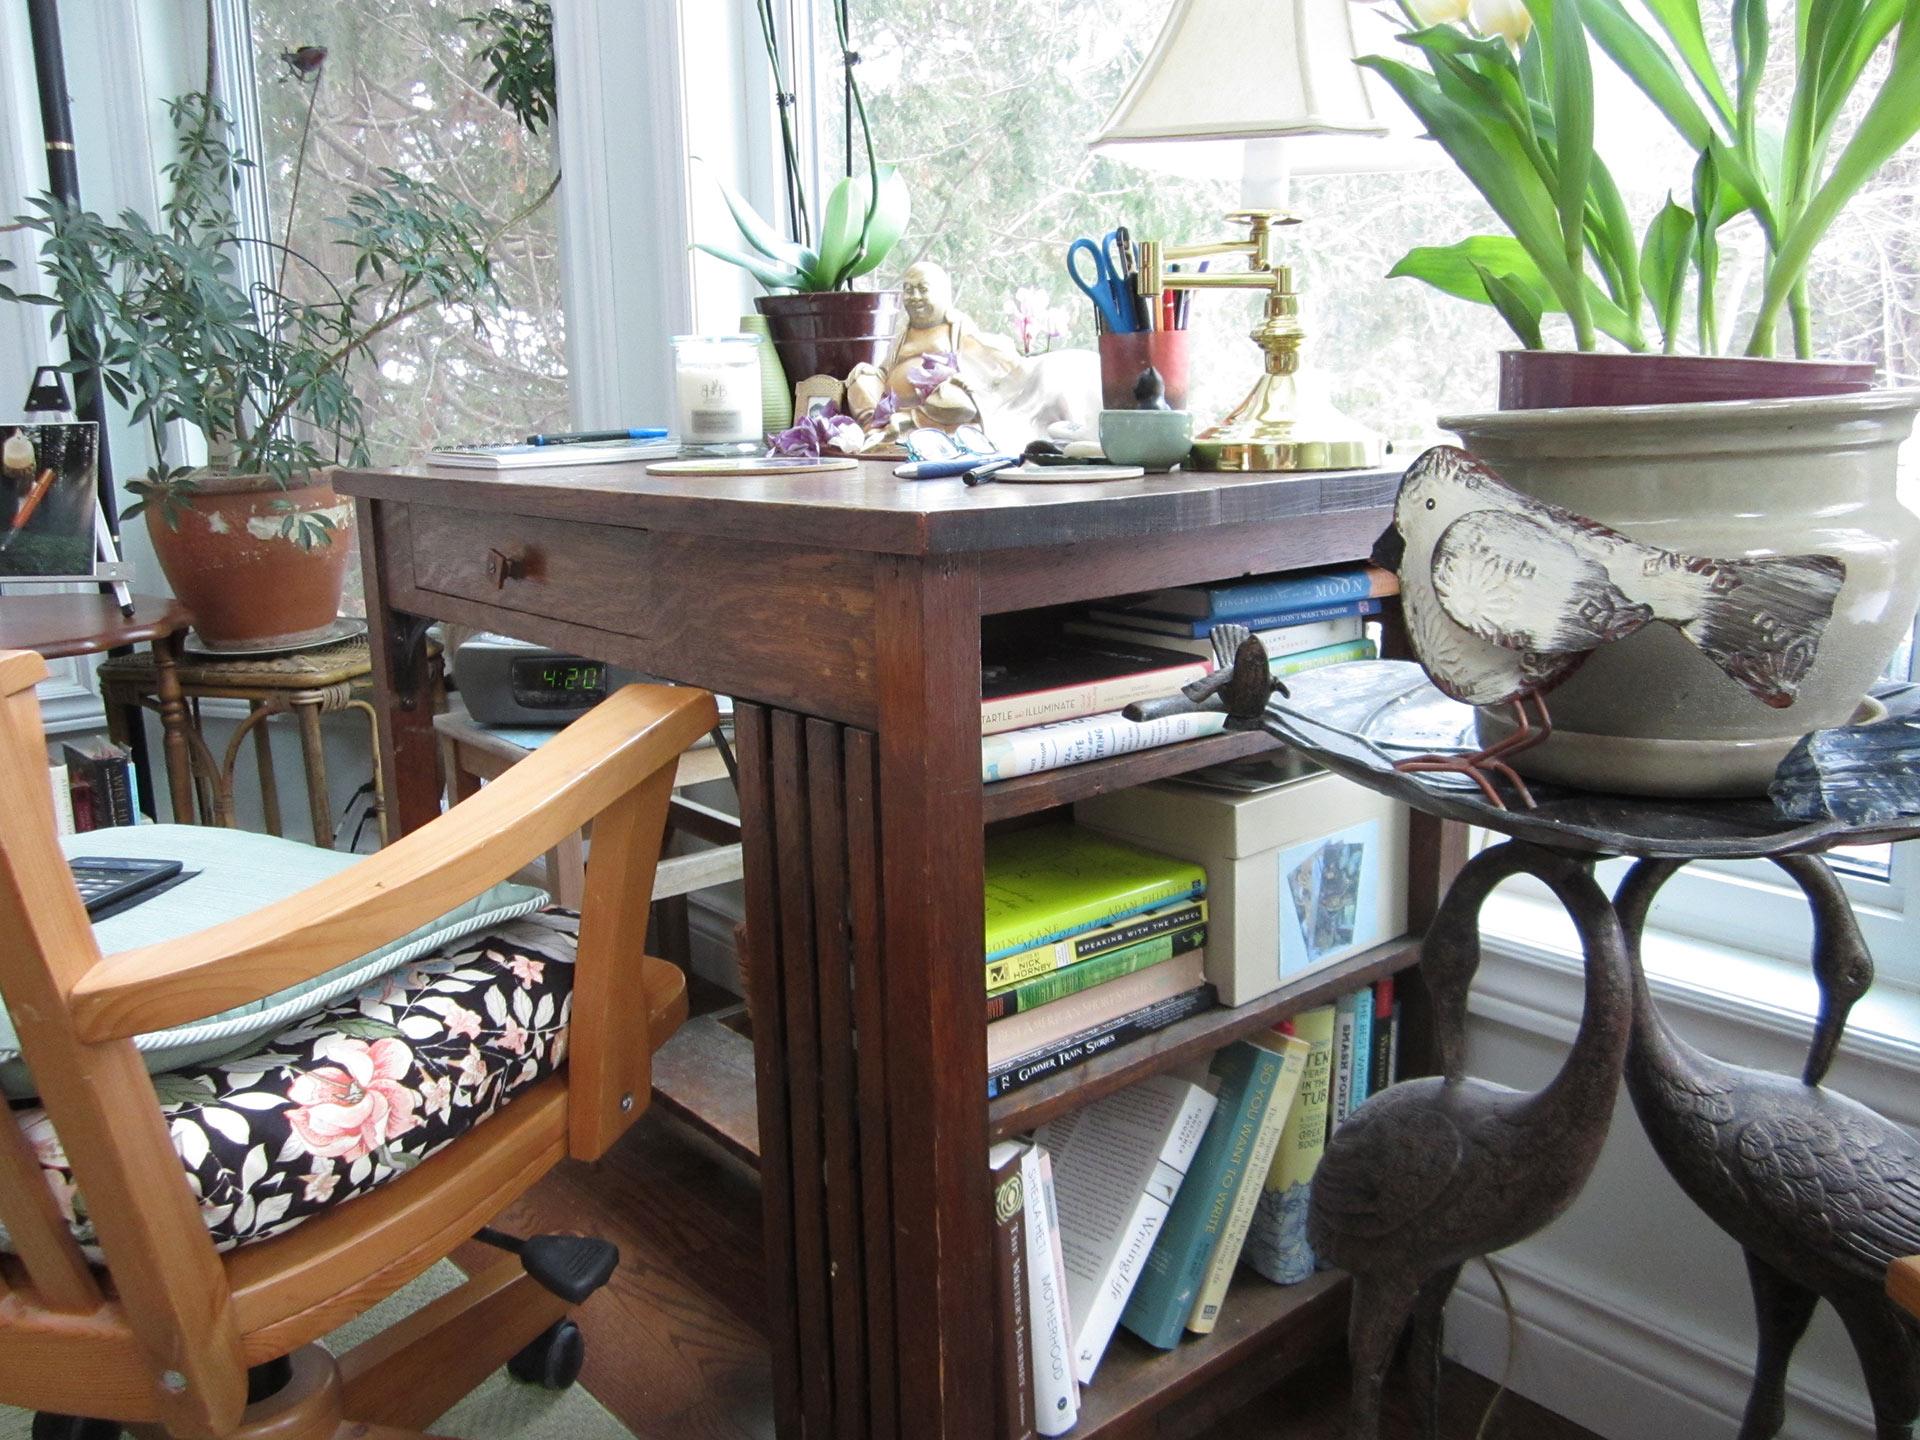 Bookshelf-desk